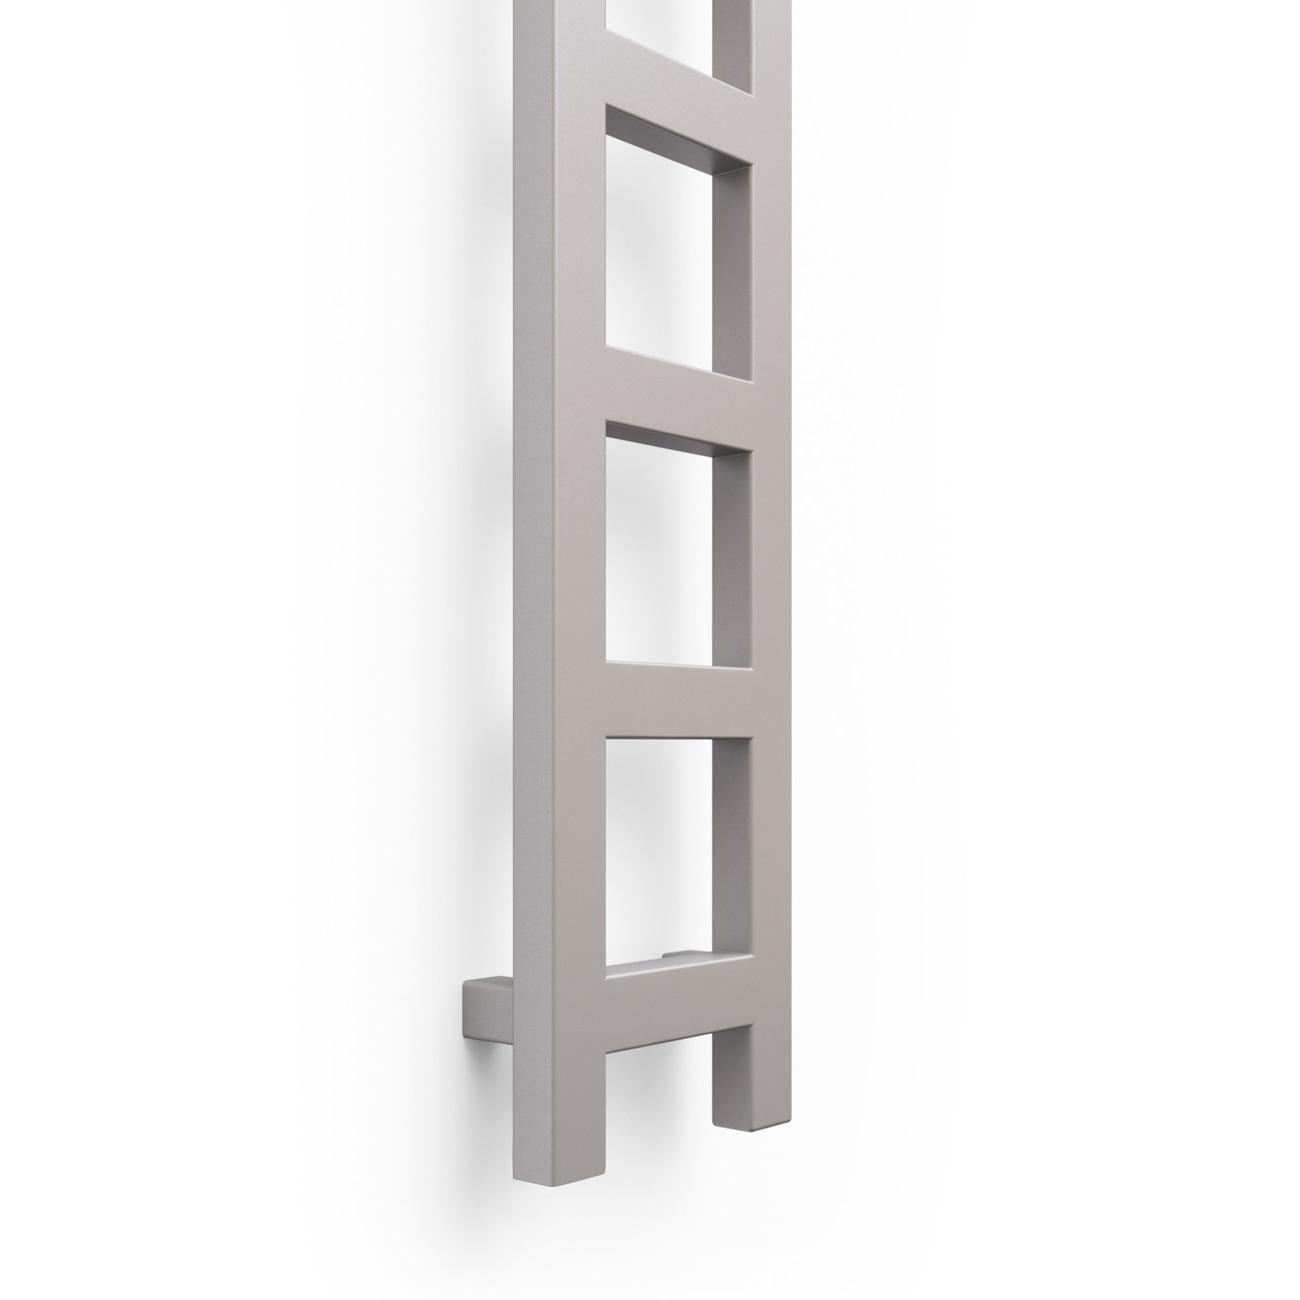 Verona Easy Designer Heated Ladder Towel Rail 1600mm H x 200mm W - Sparkling Gravel